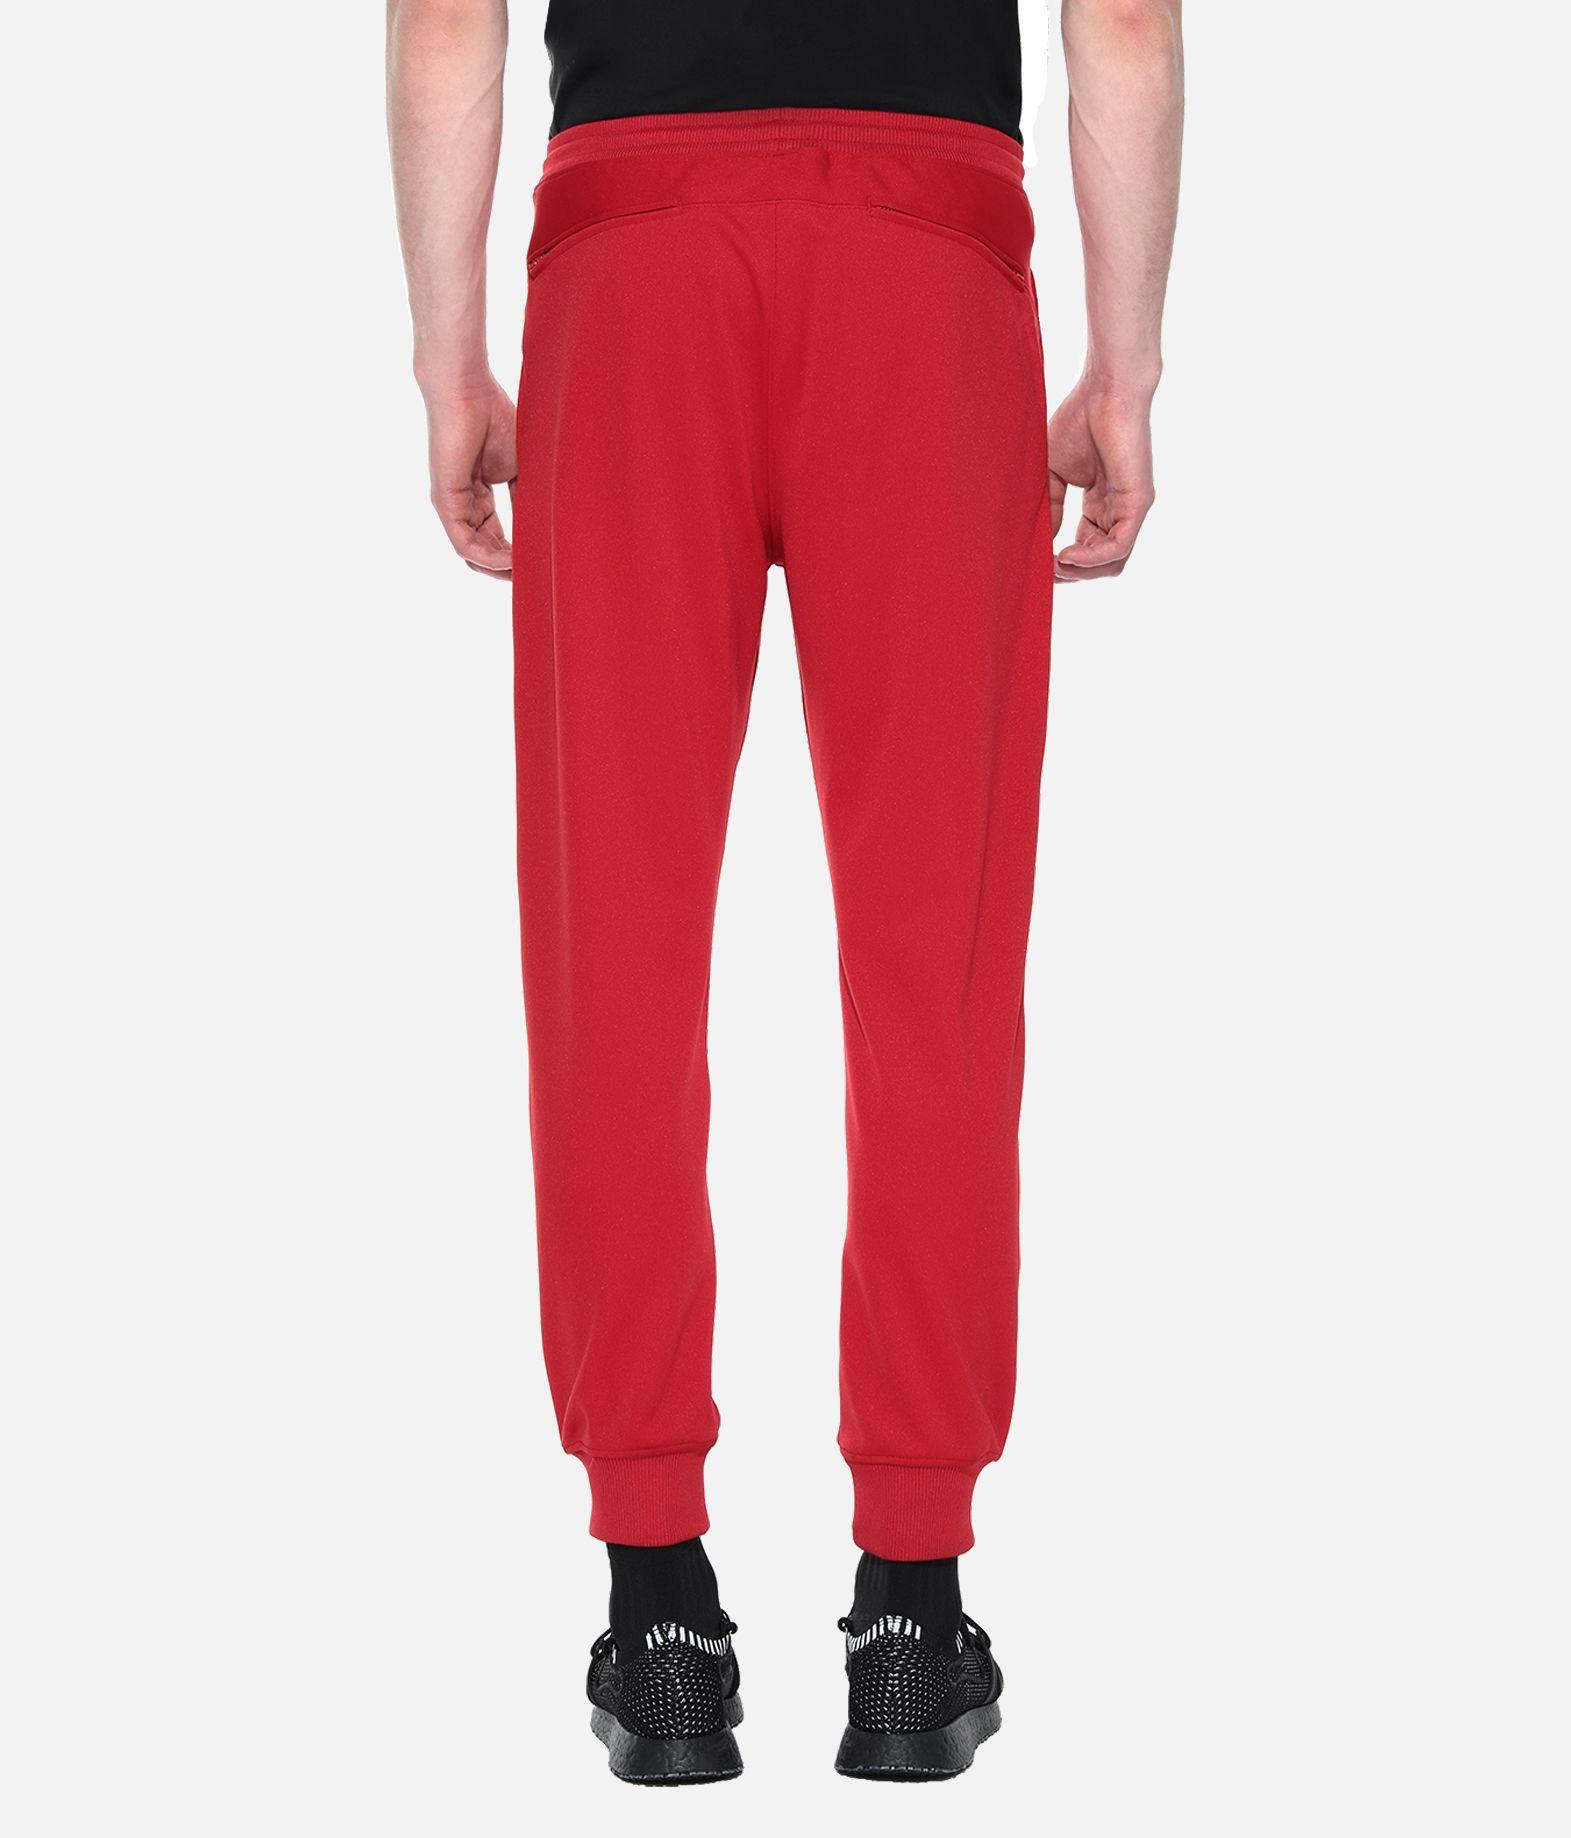 Y-3 Y-3 Classic Track Pants Тренировочные брюки Для Мужчин d